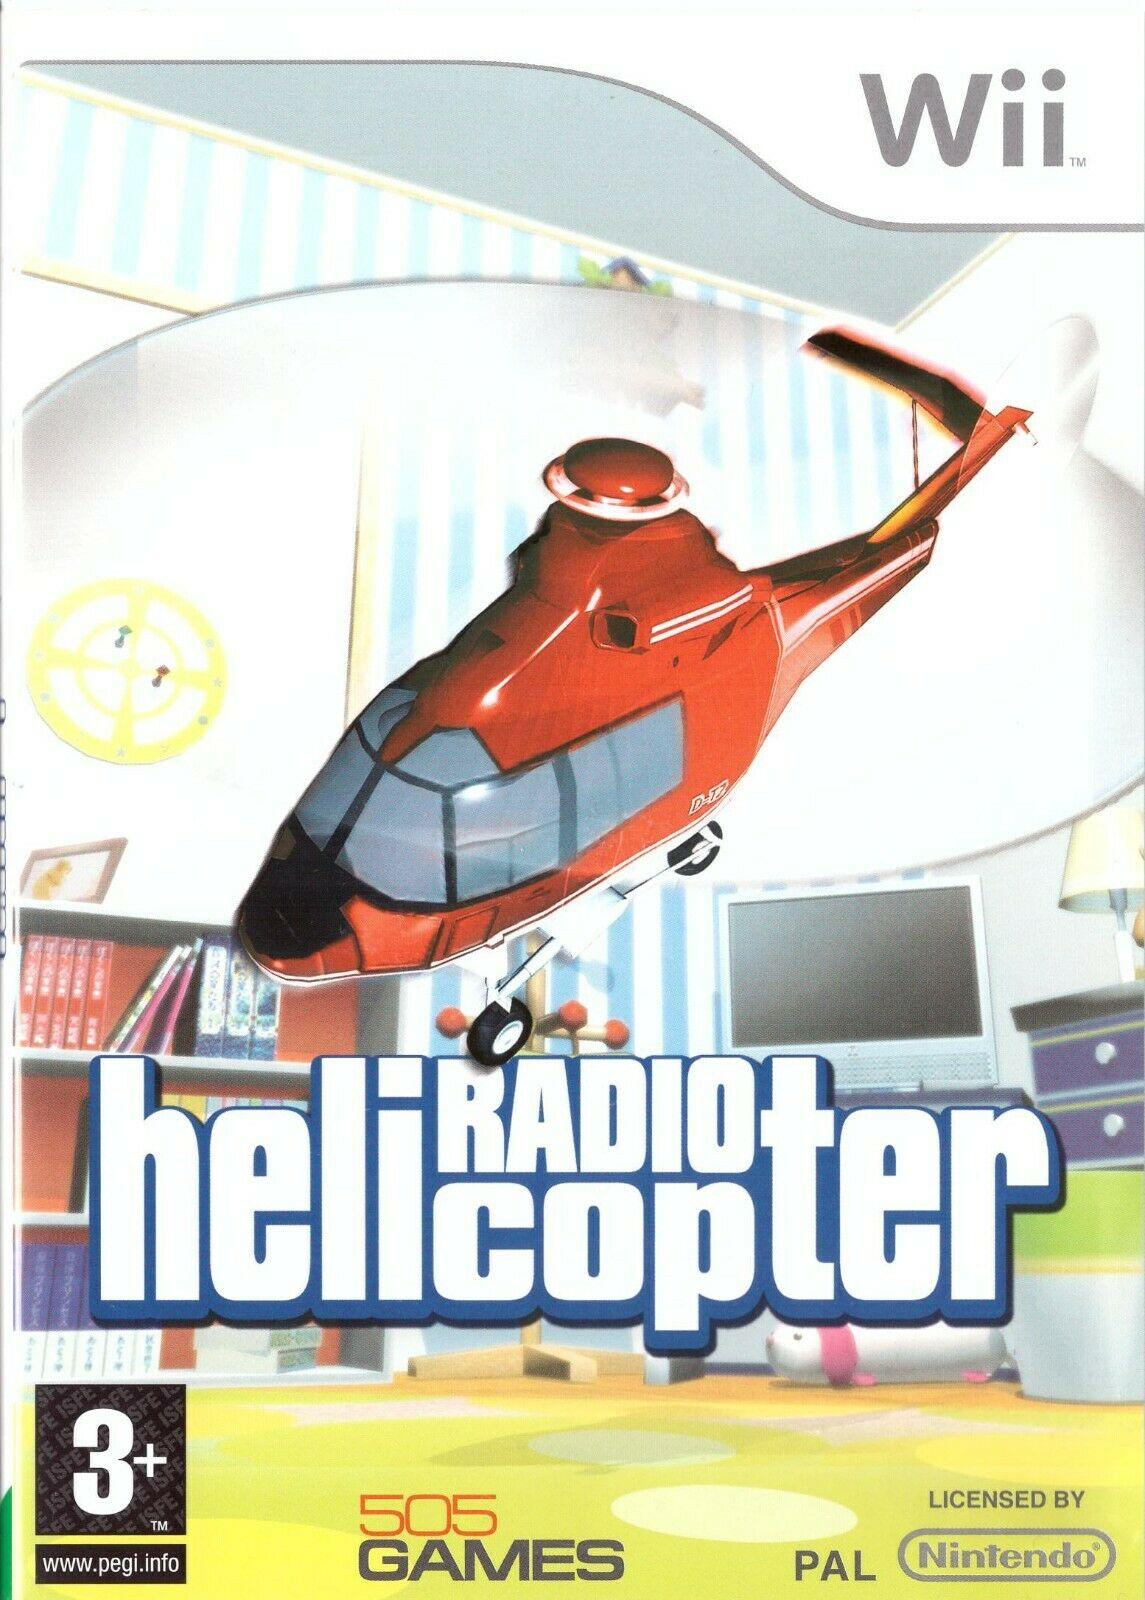 Joc Nintendo Wii Radio Helicopter Nintendo Wii - A